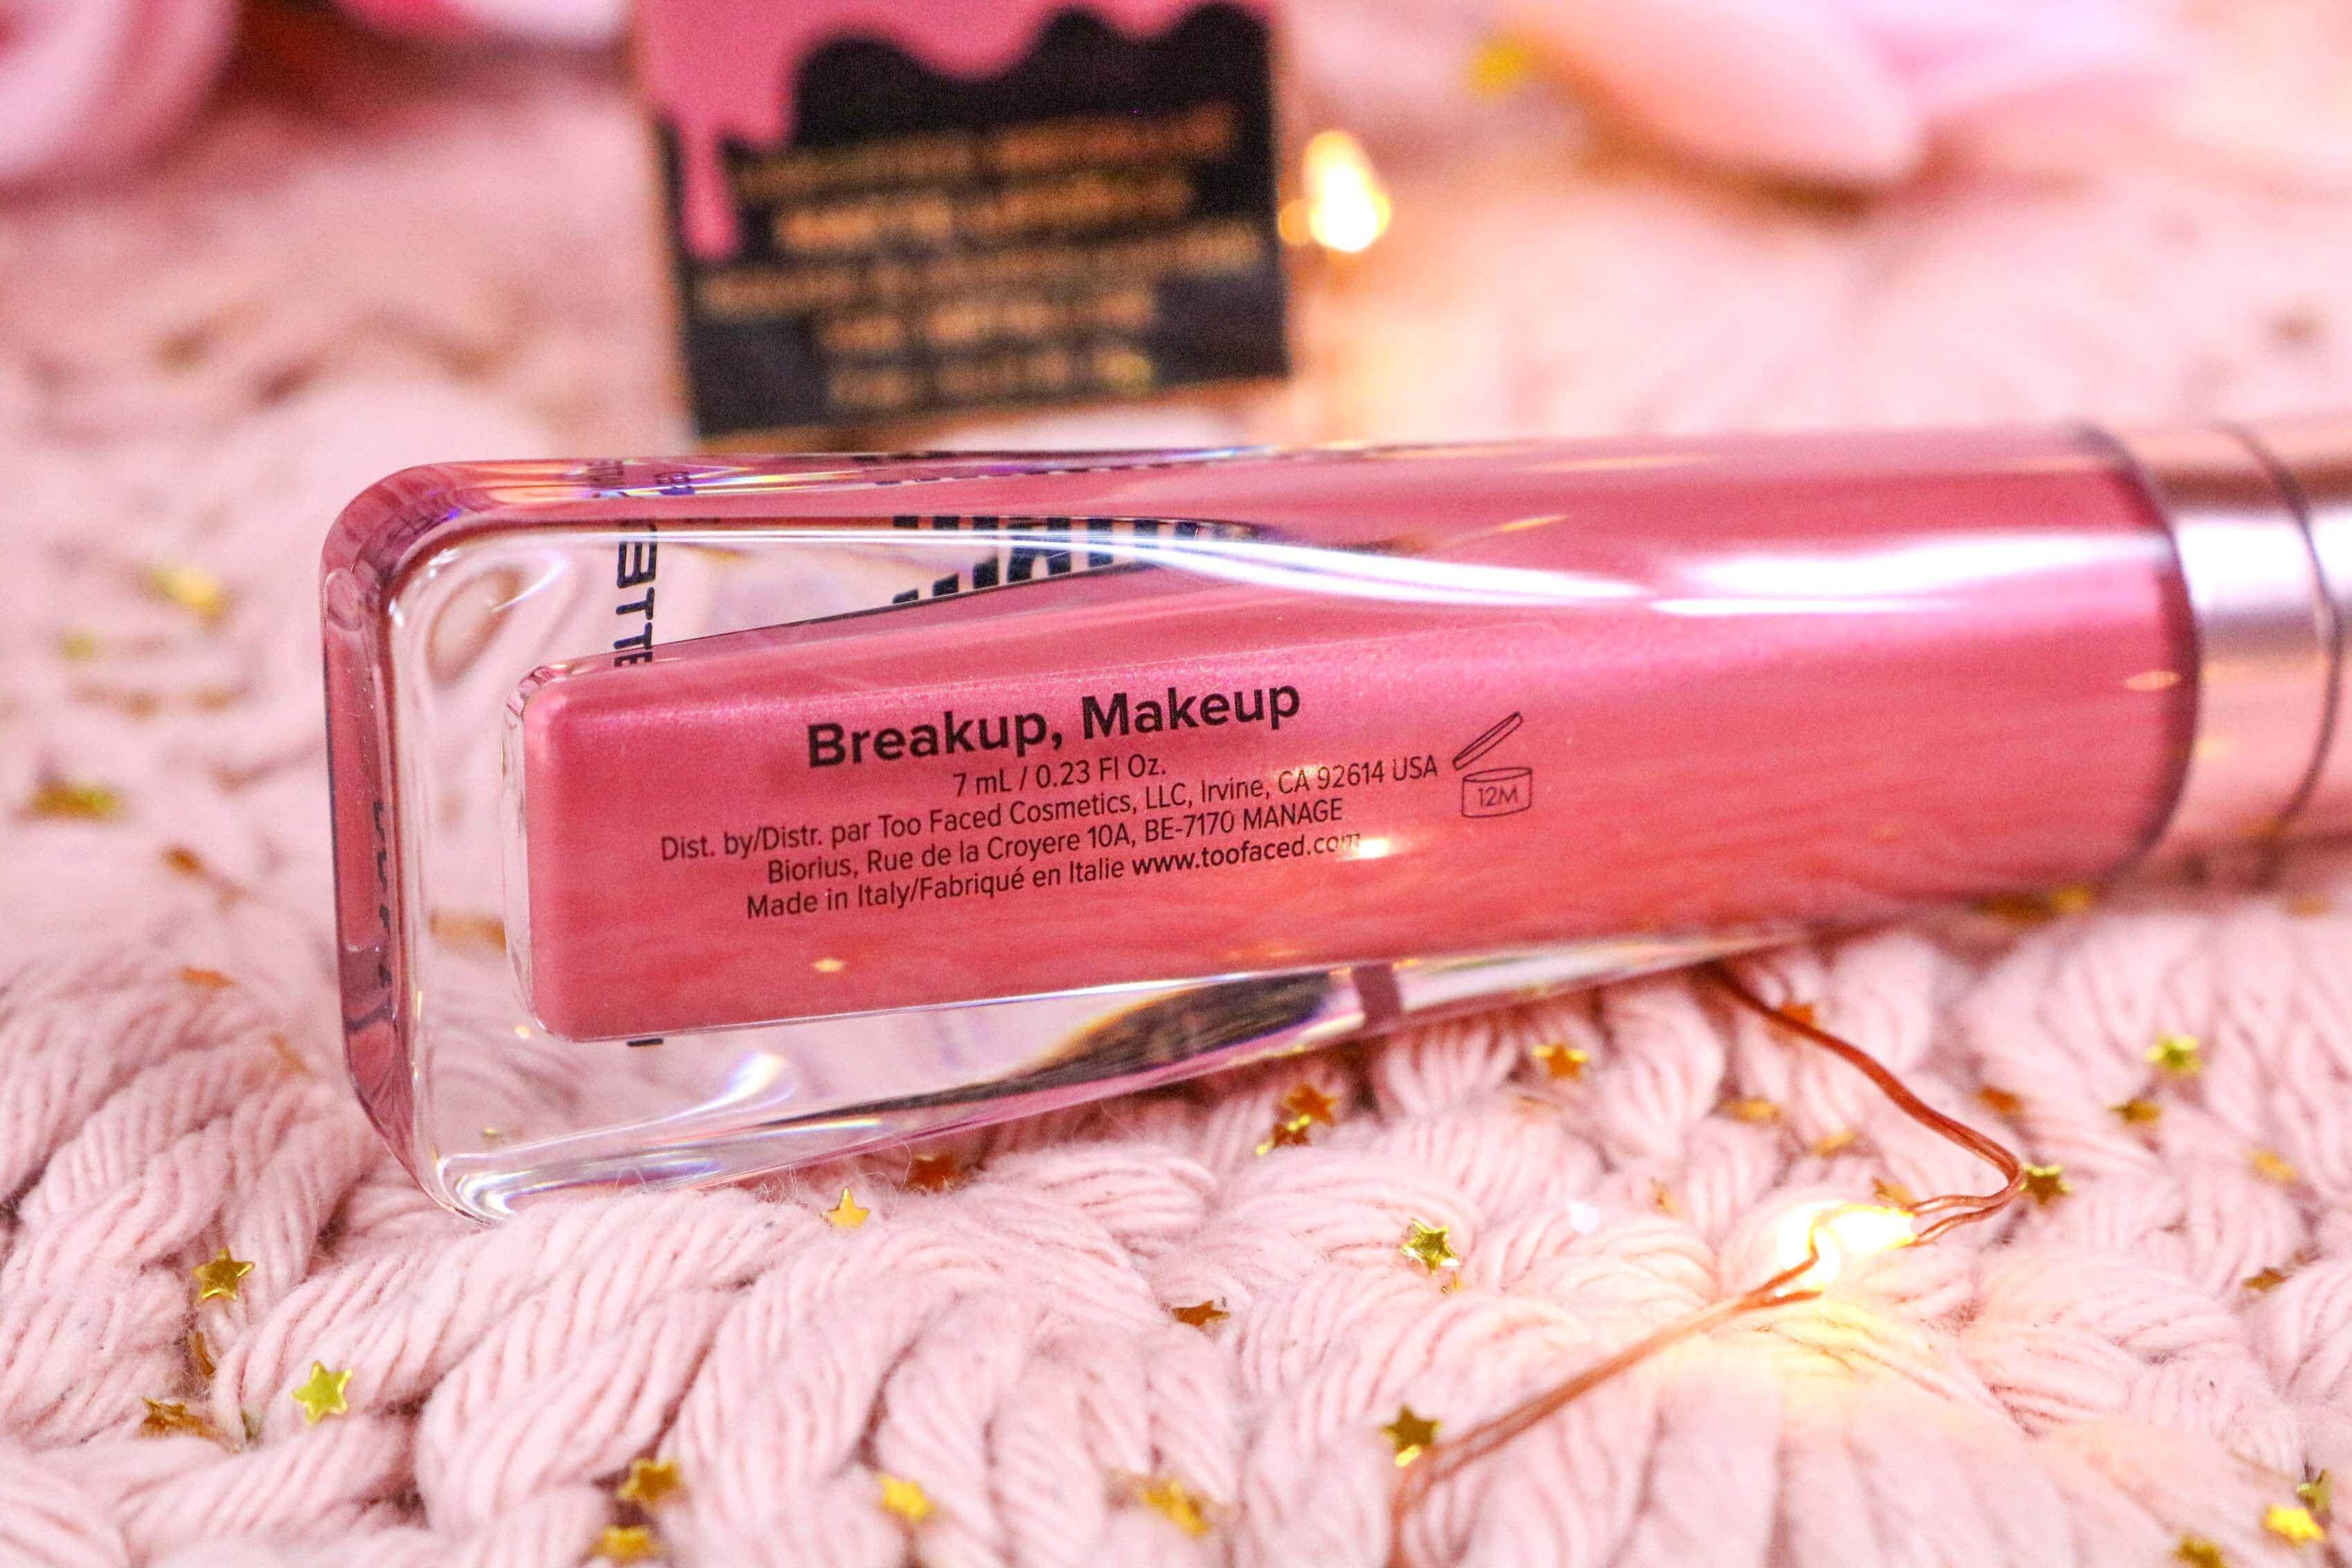 revue-melted-matte-tallic-rouge-a-levres-breakup-makeup-makeupbyazadig-sortie-france-influencer-swatch-avis-prix-quantite